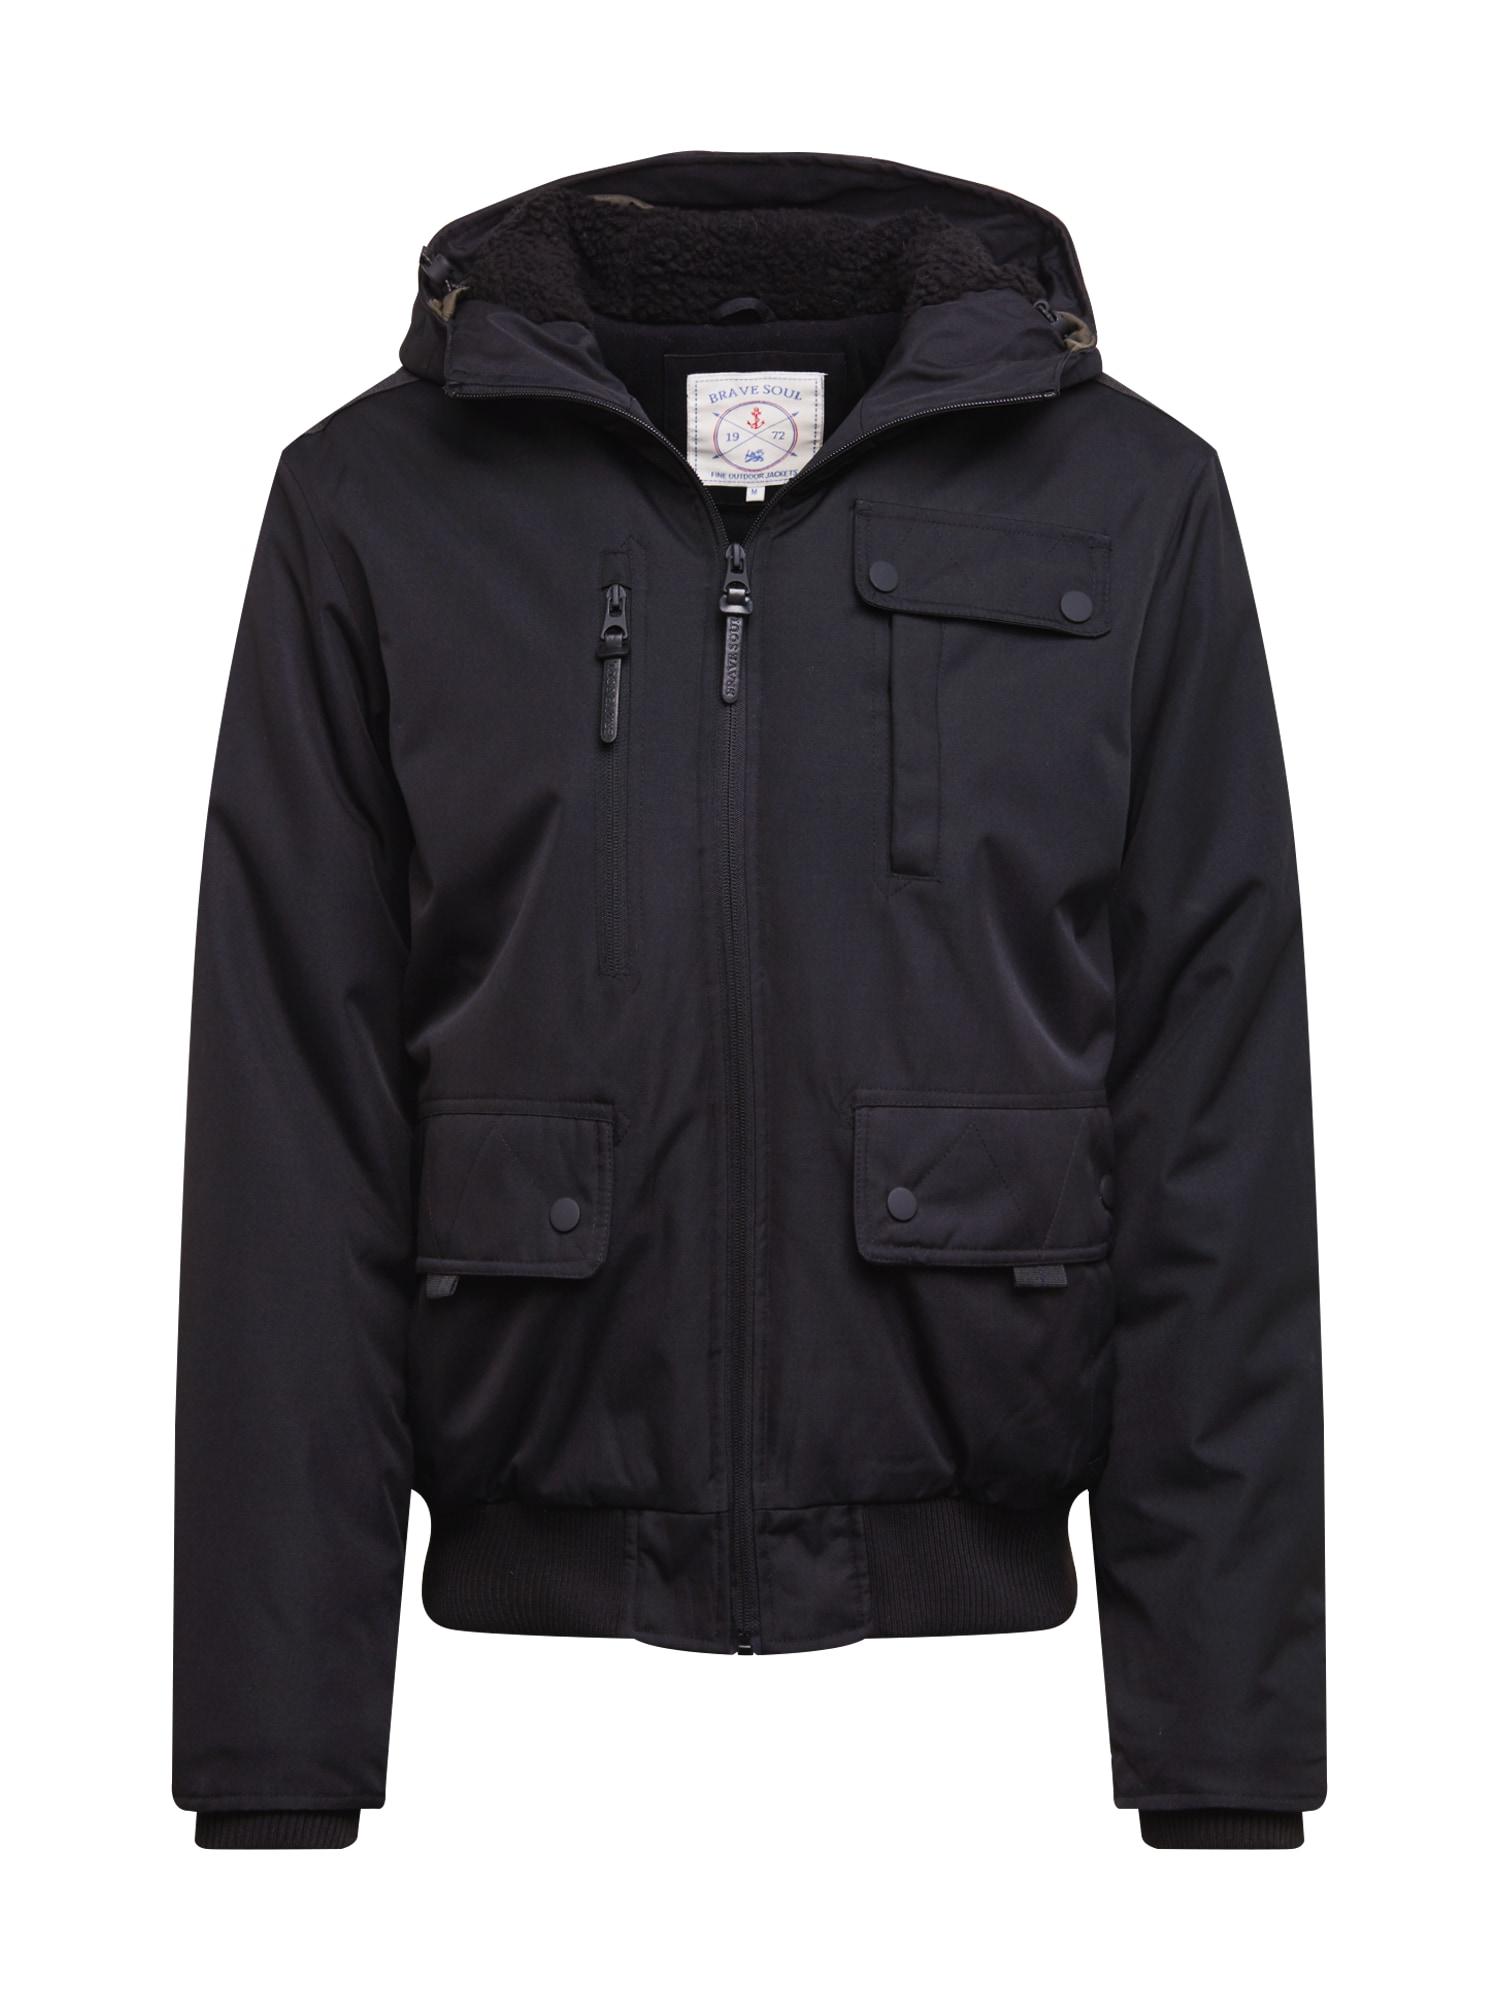 BRAVE SOUL Žieminė striukė 'JK-Tobyi' juoda